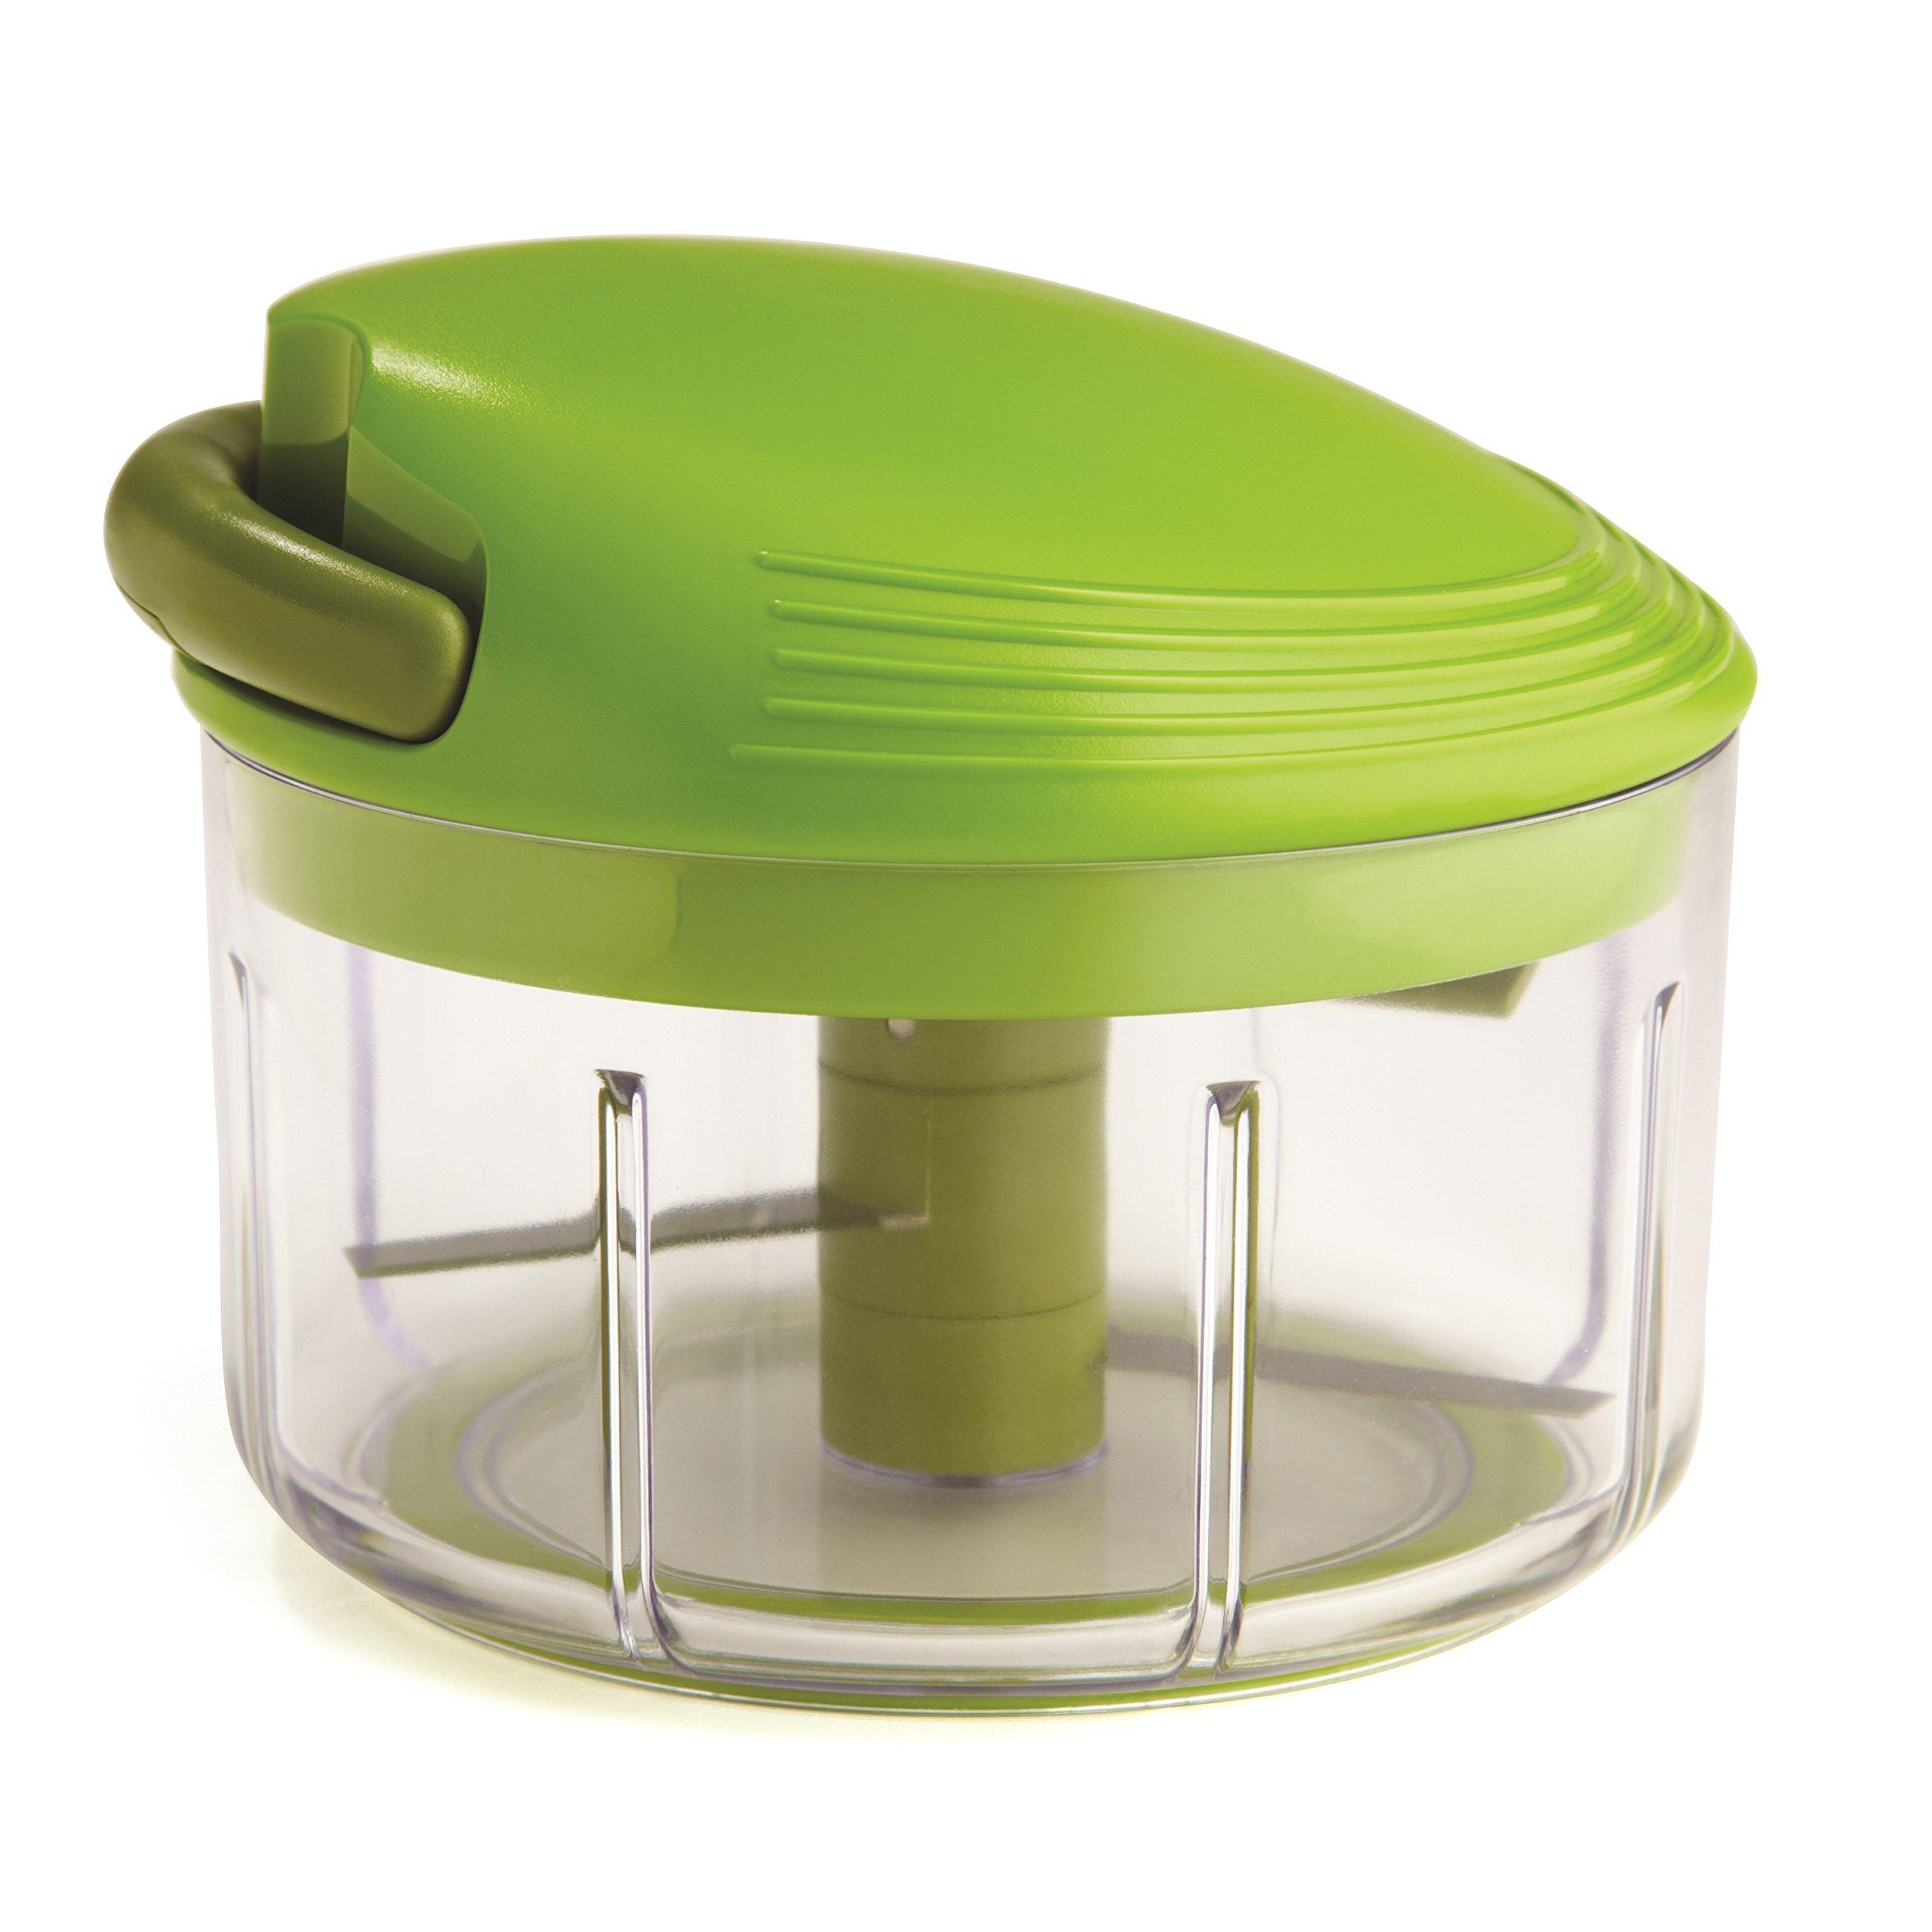 Kuhn Rikon Pull Chop, 2 Cup Food Chopper, Green by Kuhn Rikon